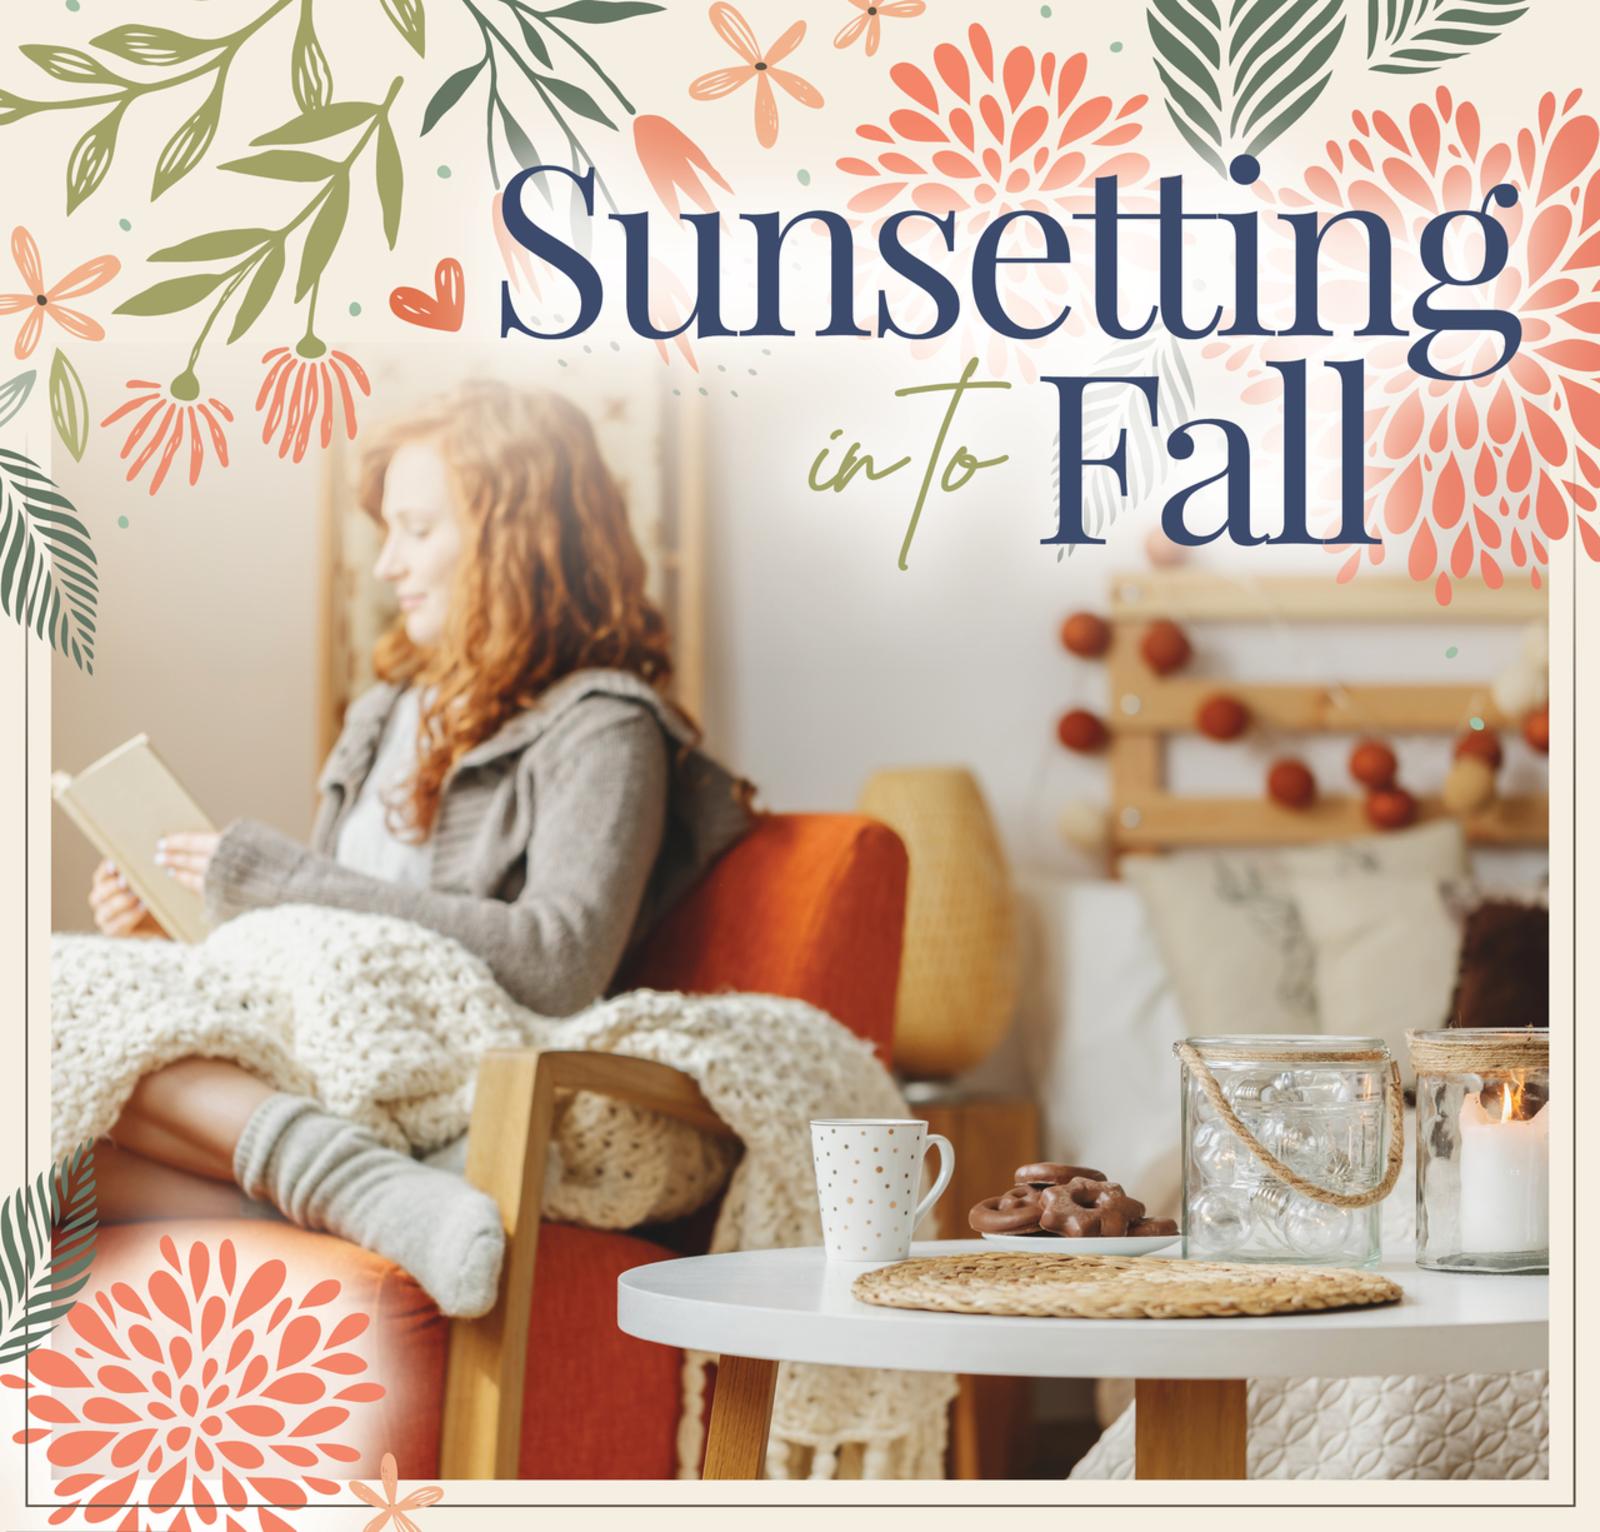 Sunsetting Into Fall